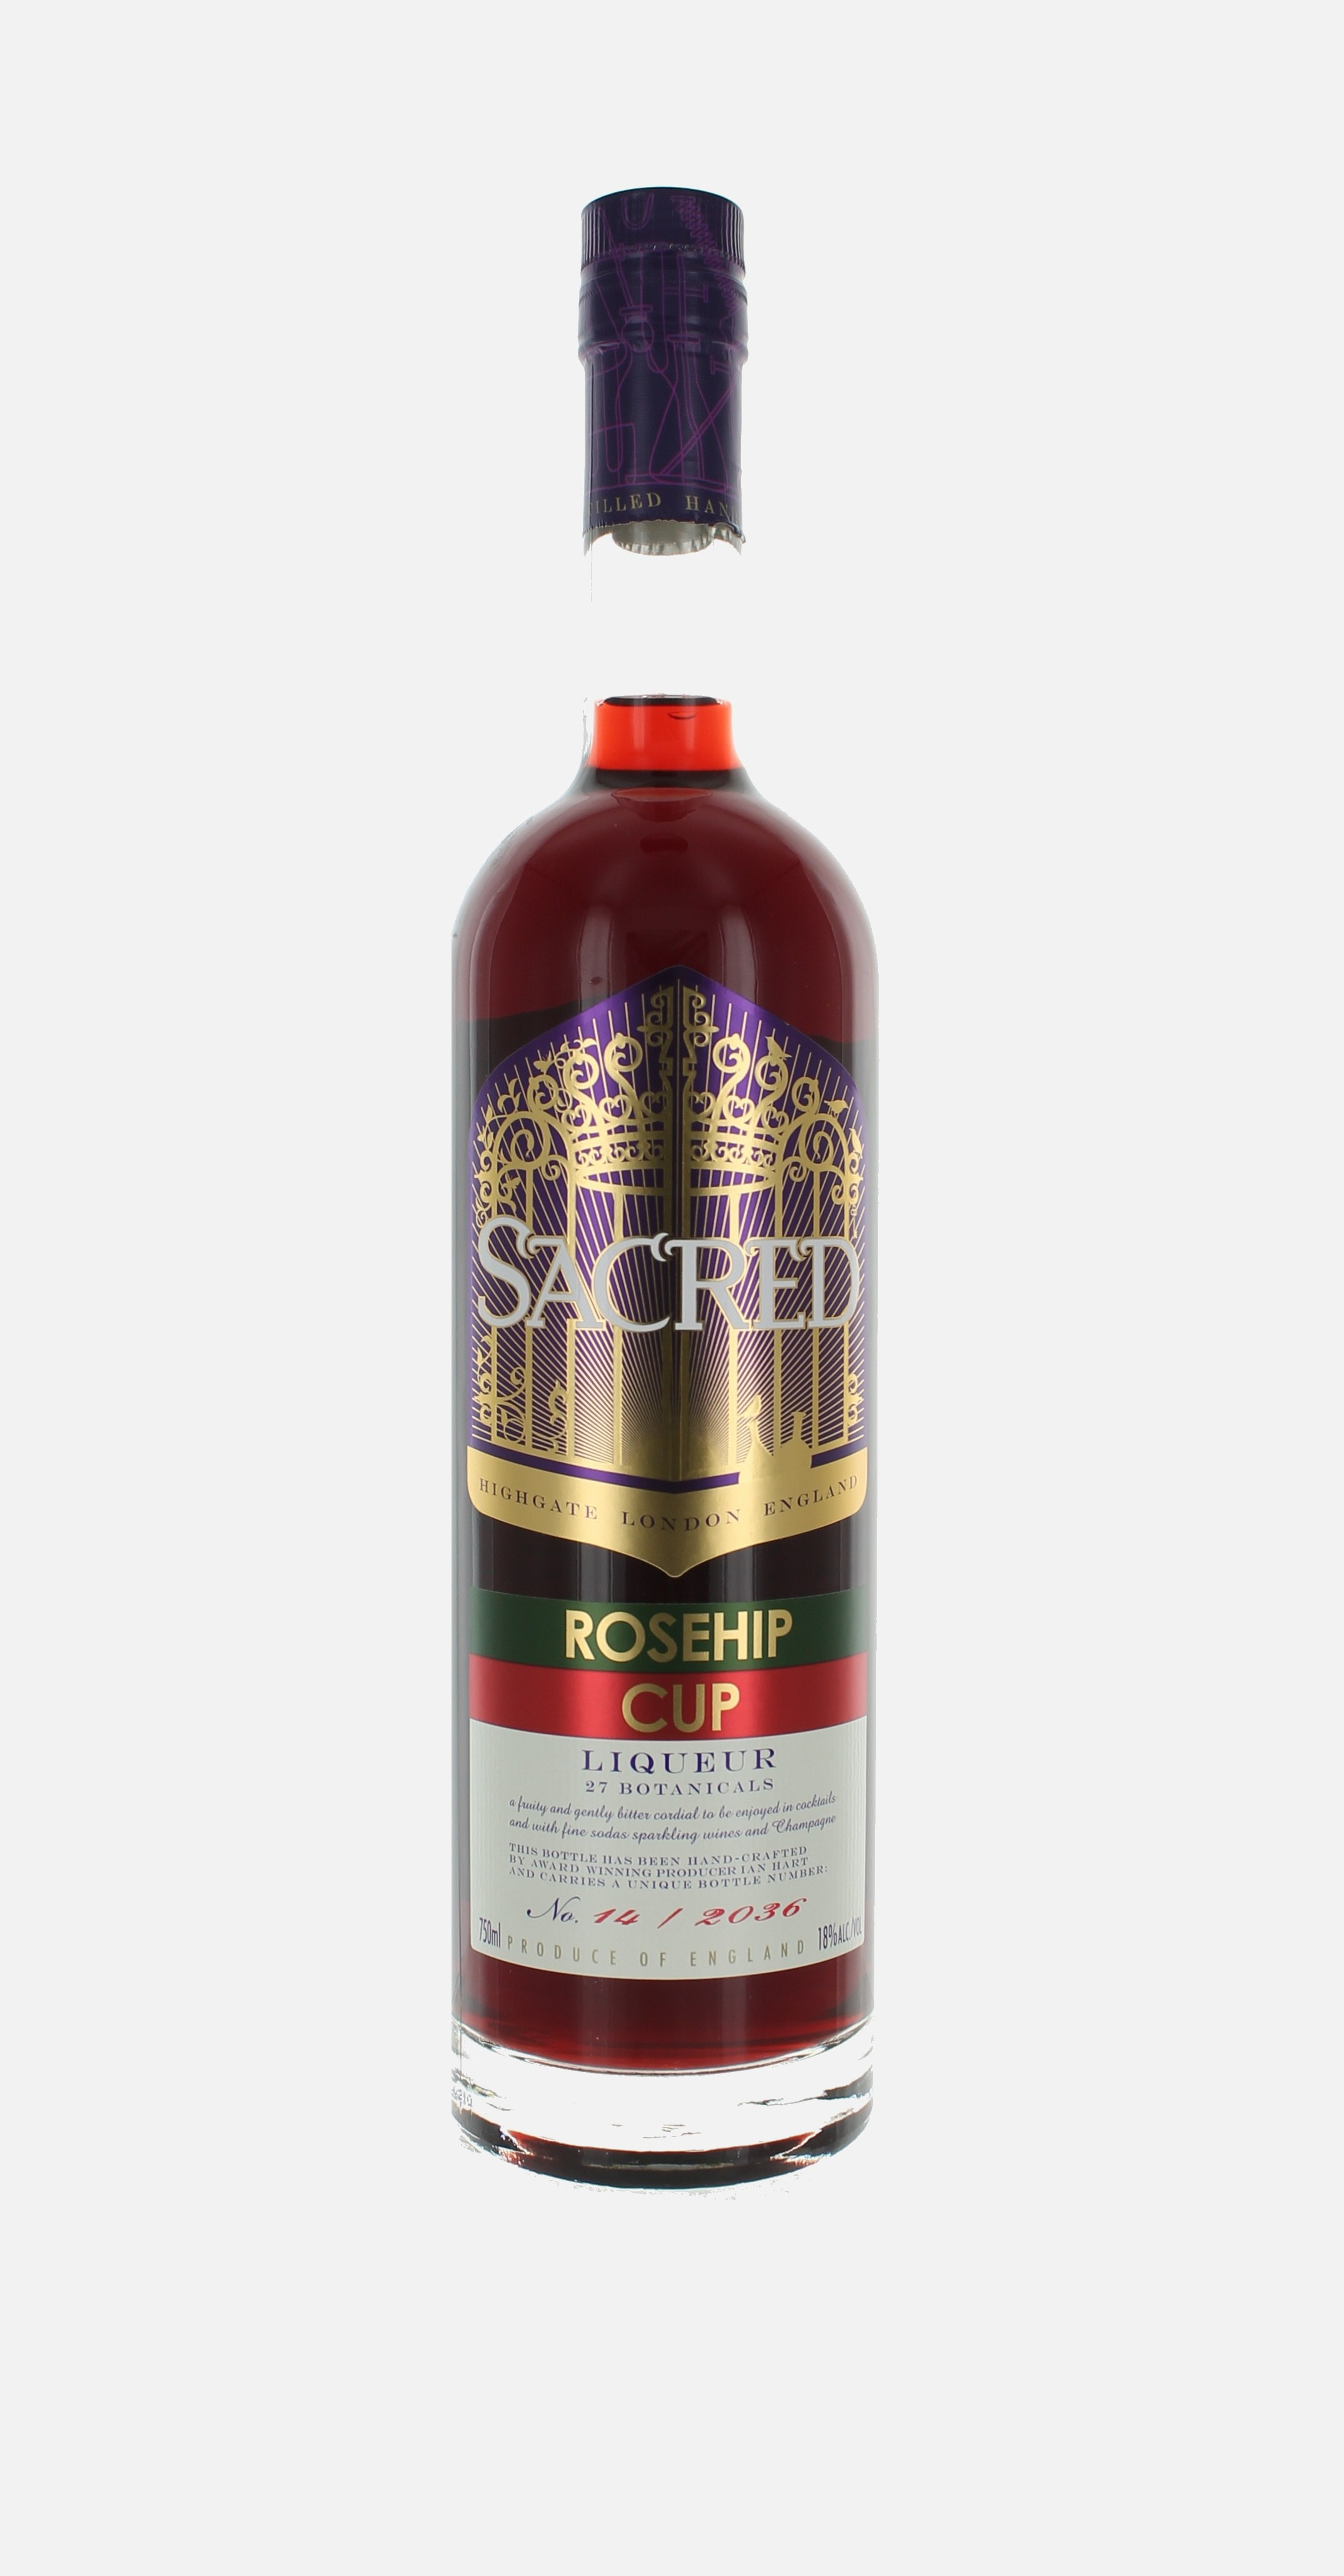 Sacred Rosehip Cup, Liqueur